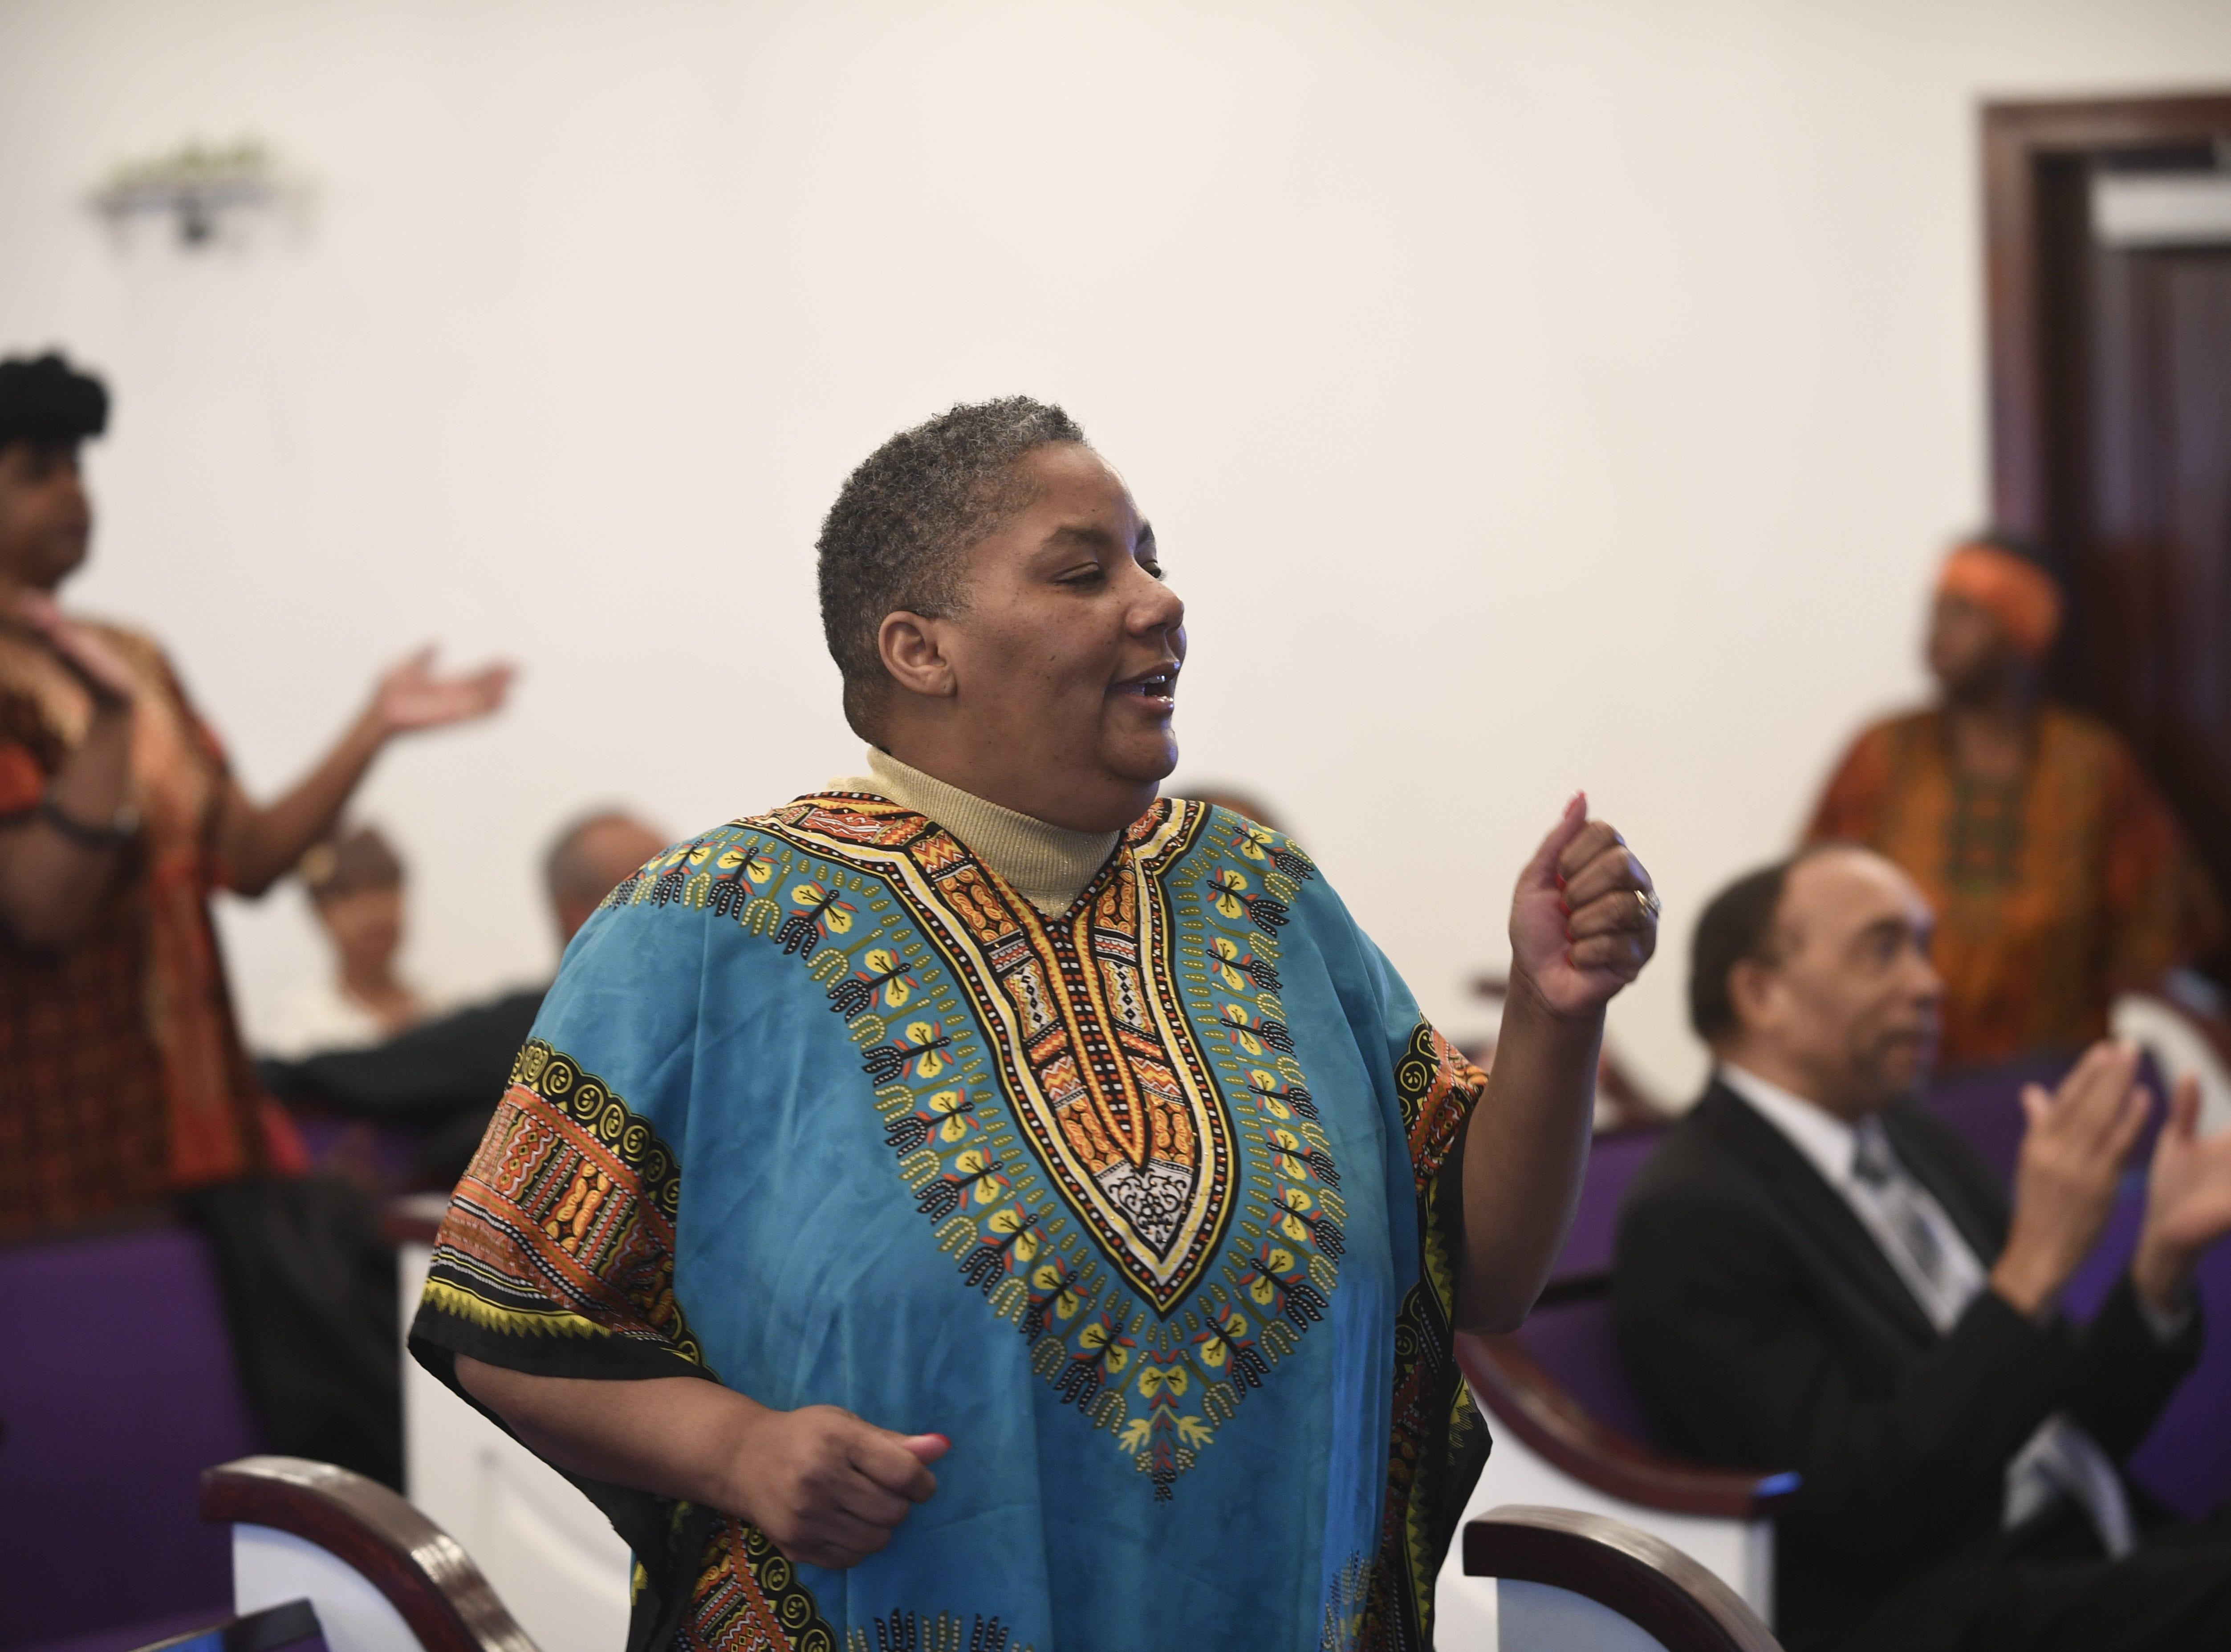 Kathy Anderson dances during Mt. Pleasant Church's Black History Month event, in Pinson, Tenn. Feb 24, 2019.